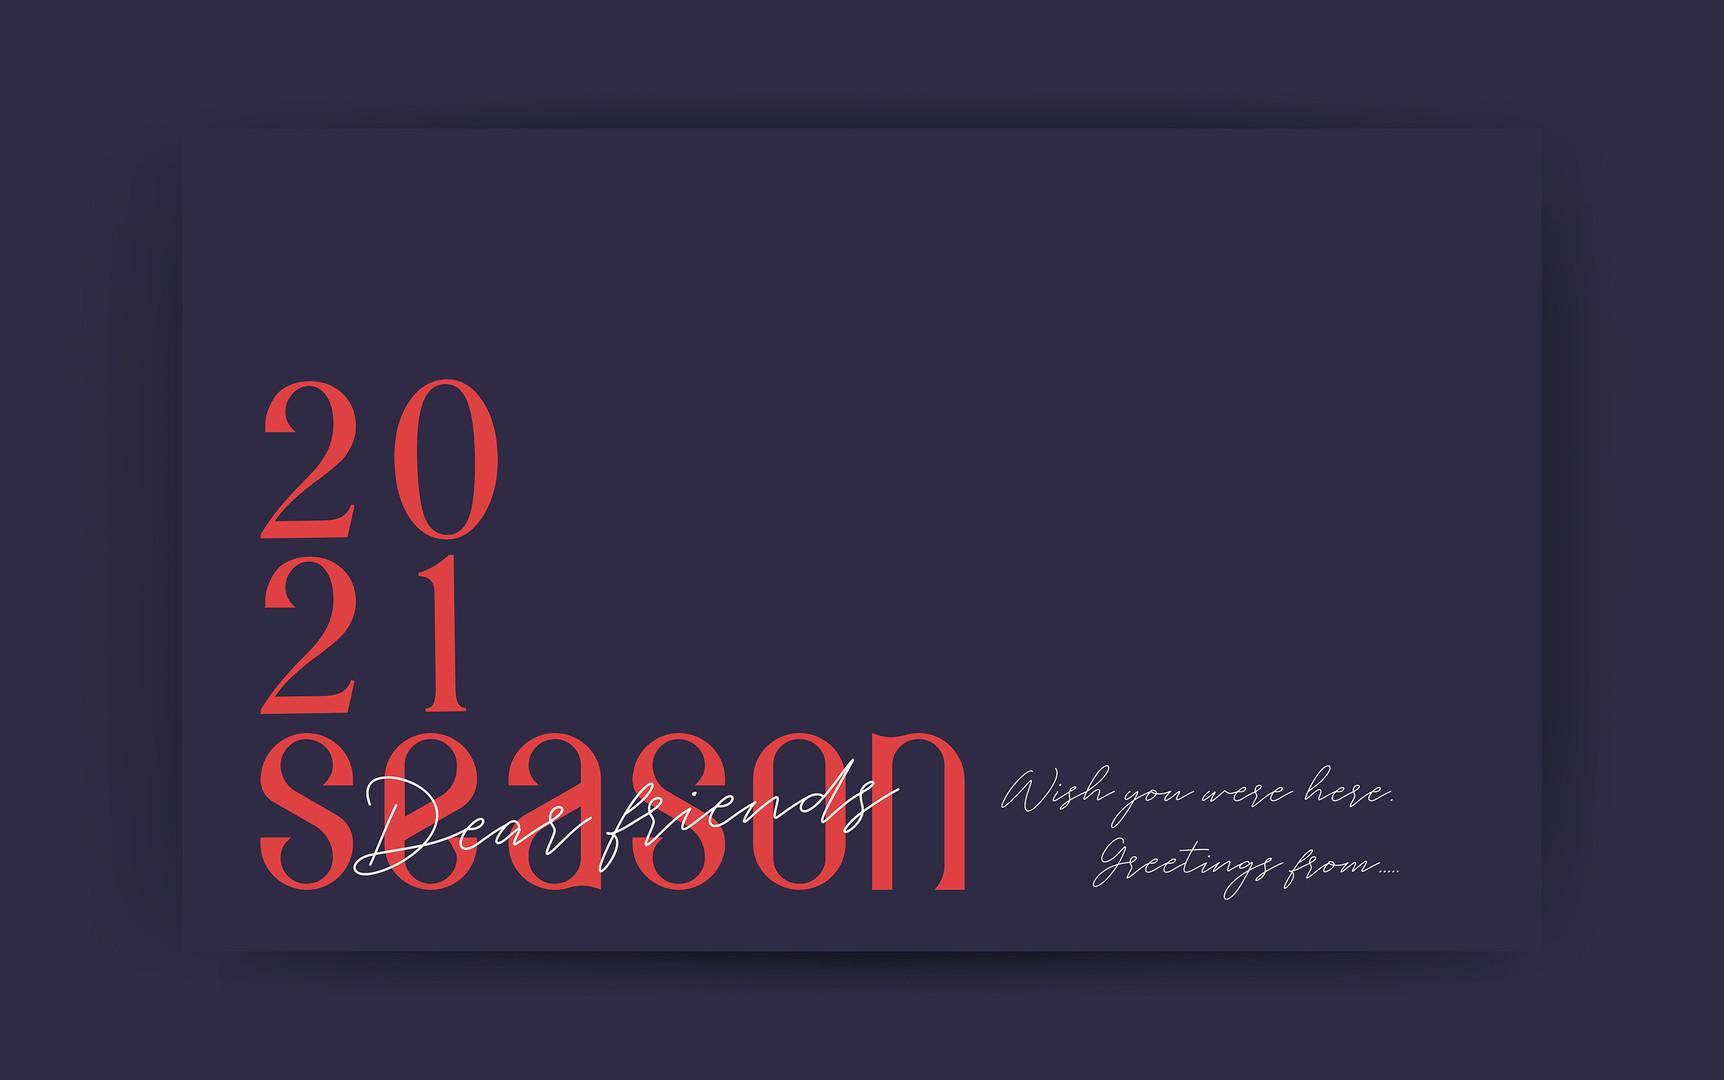 season 2021_Web-01_RESIZE.jpg